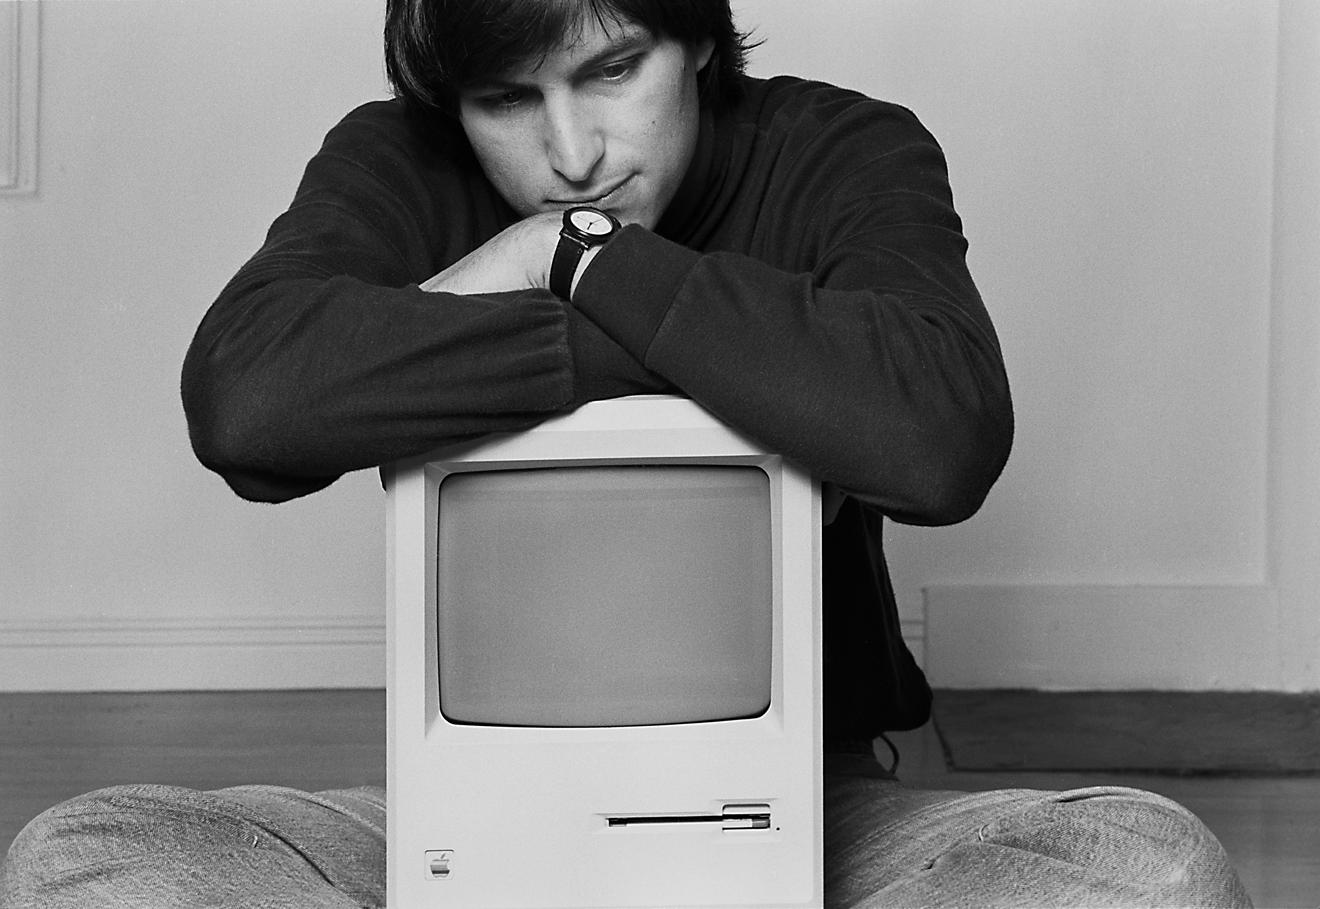 Steve Jobs bem jovem, por Norman Seeff